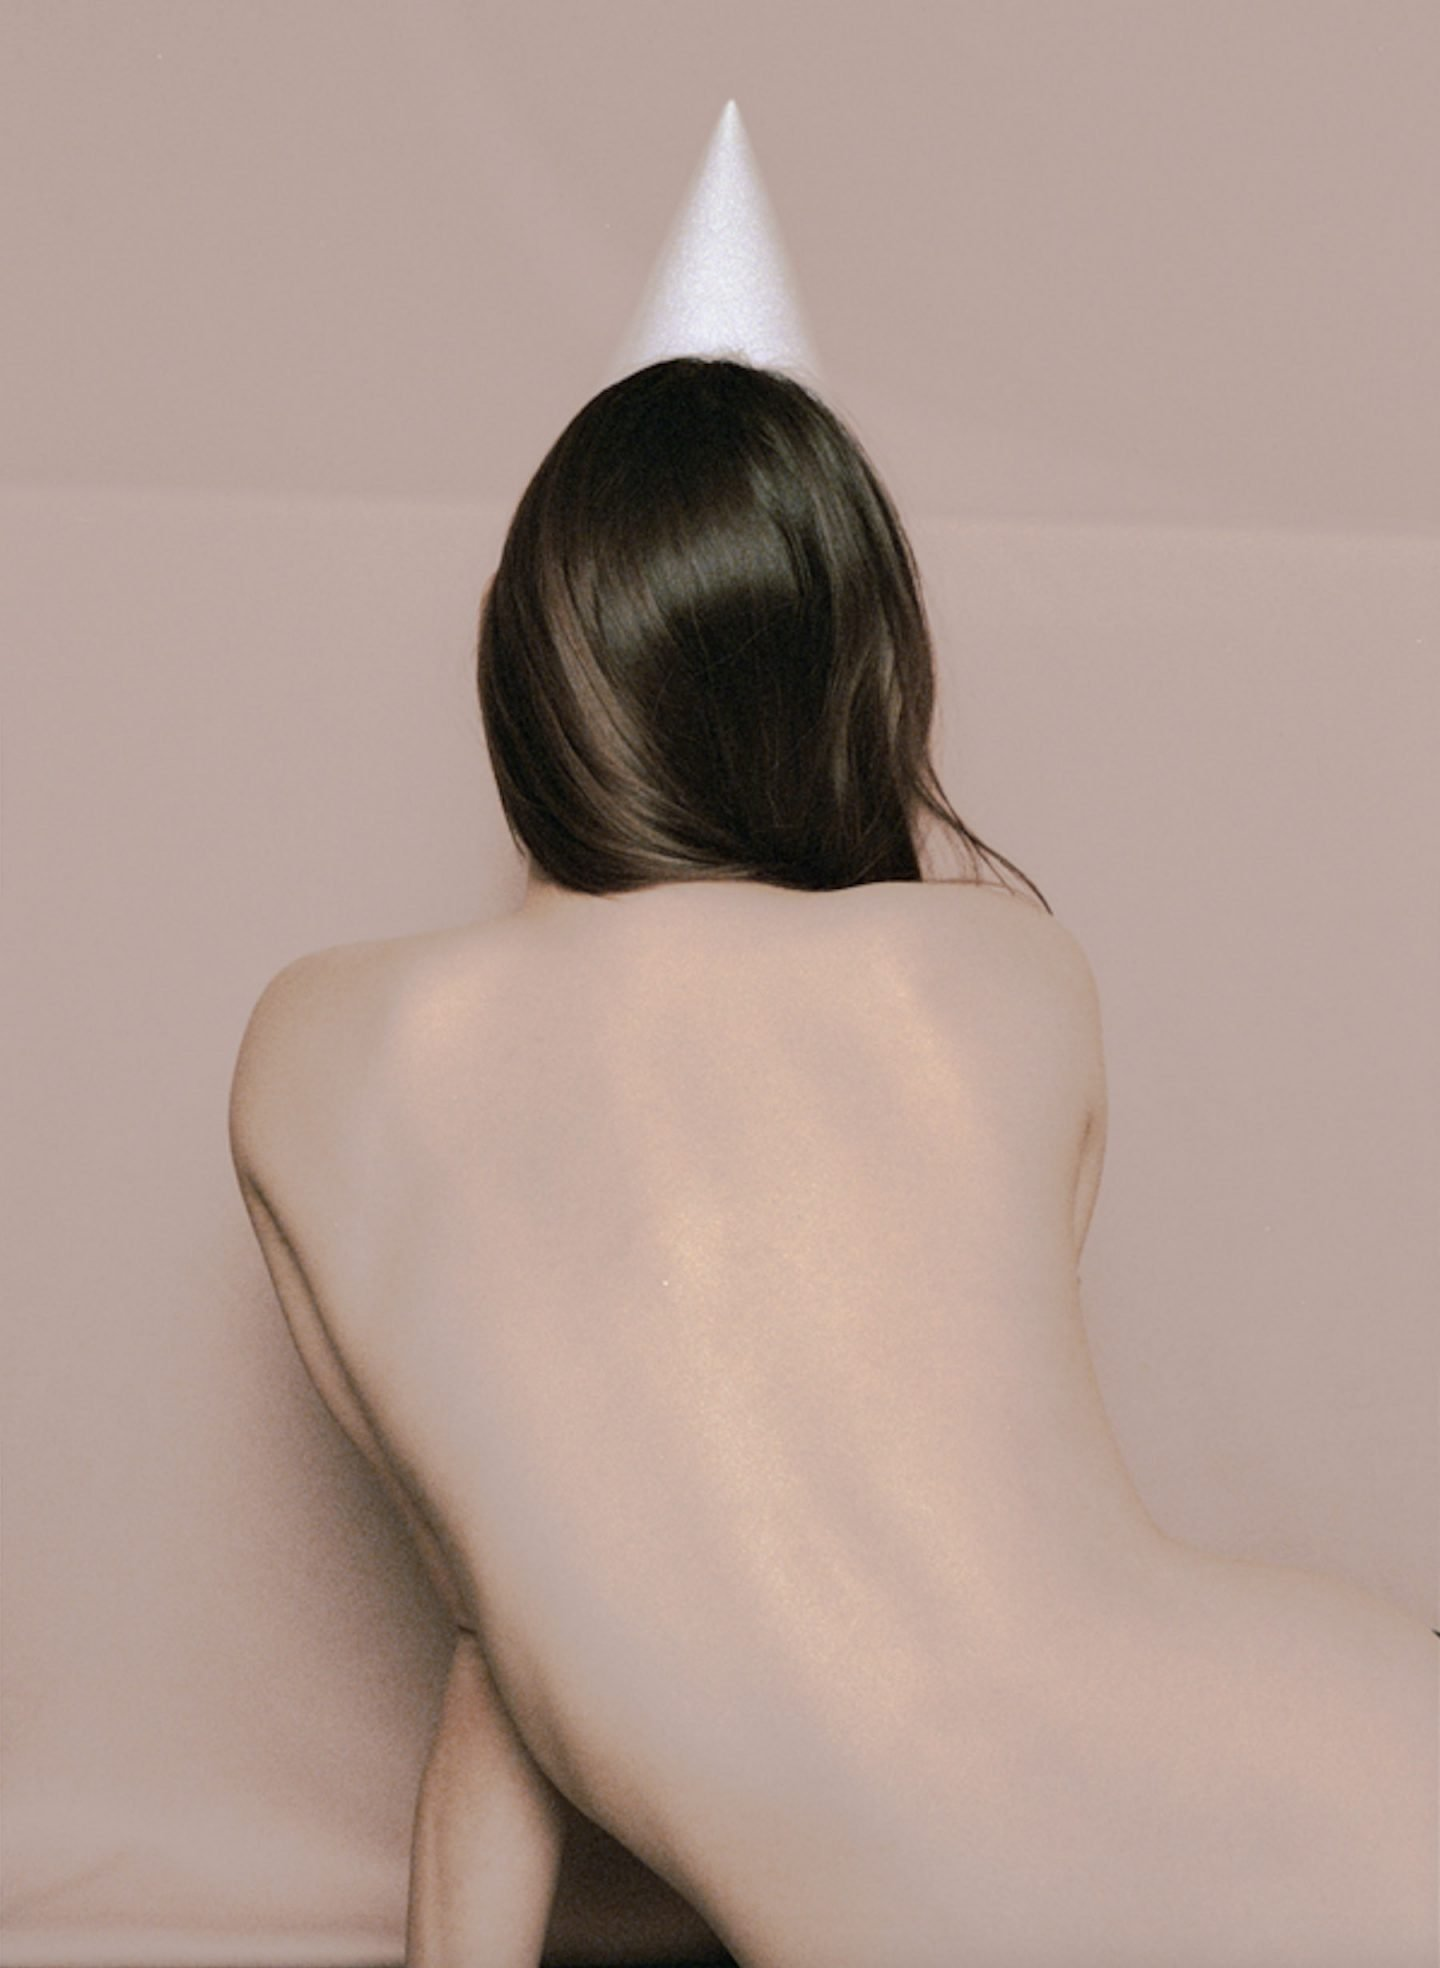 iGNANT-Photography-Rala-Choy-08